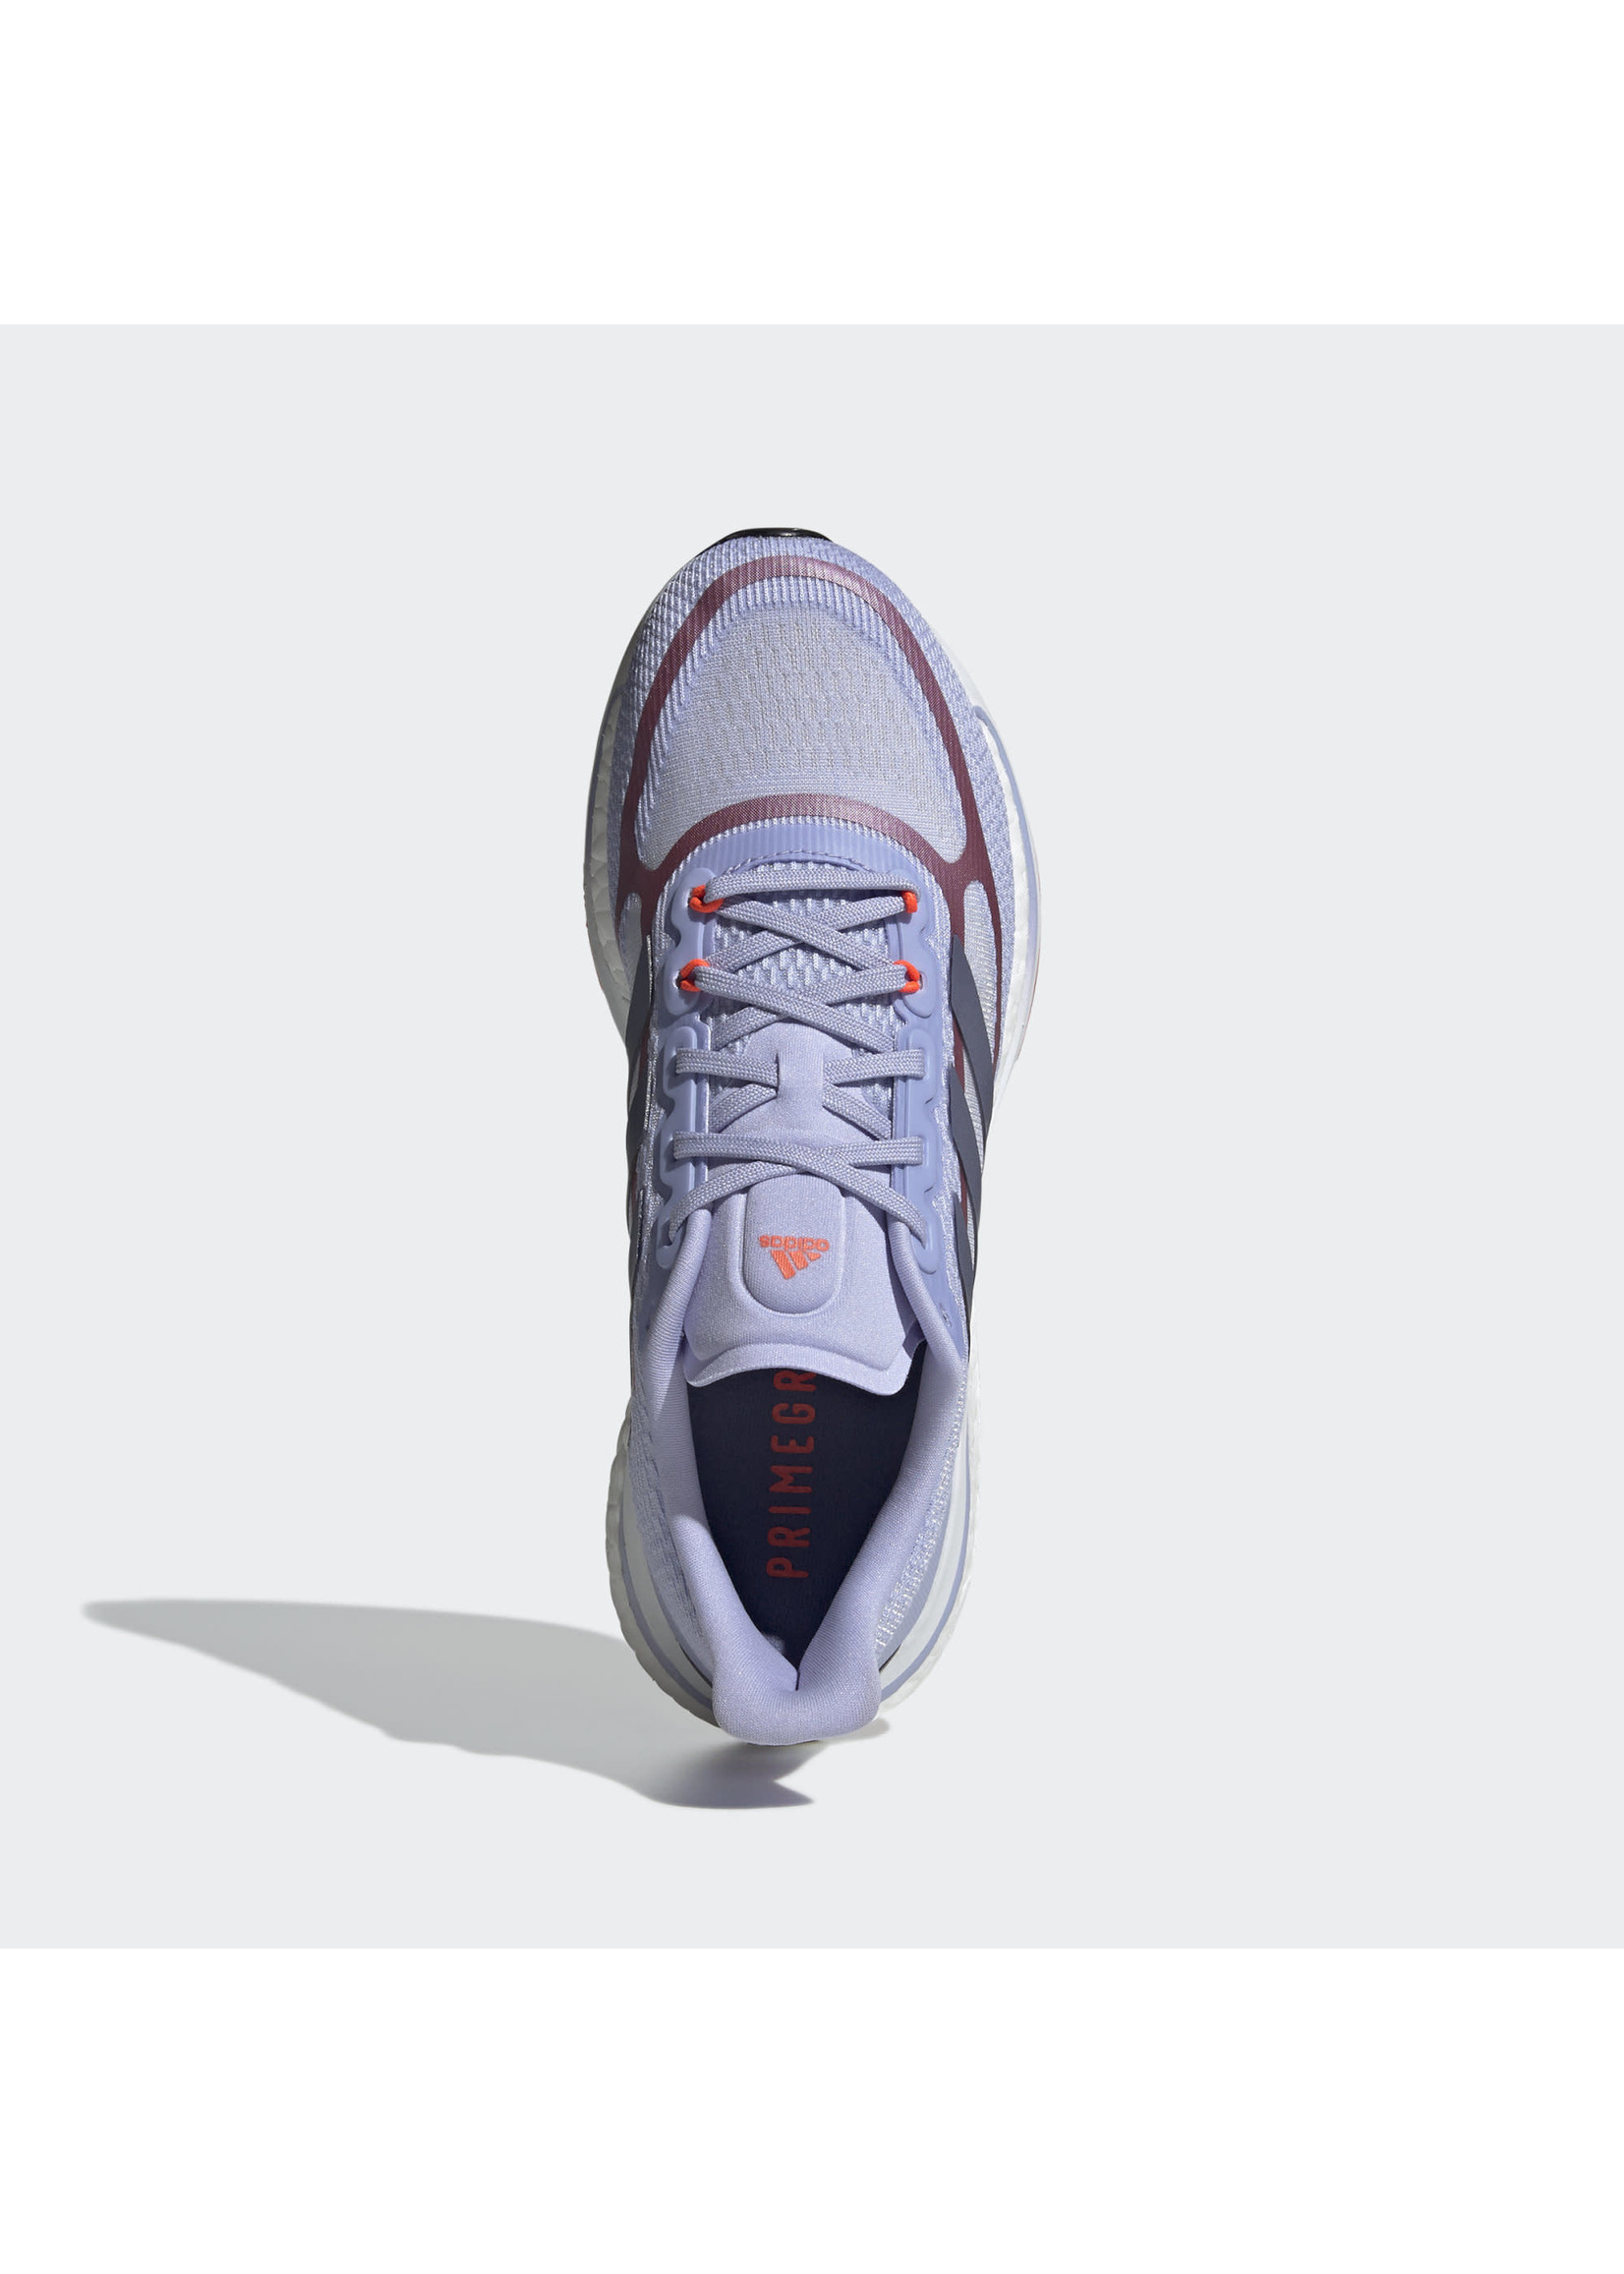 Adidas Adidas Supernova Ladies Running Shoe (2021) - Blue